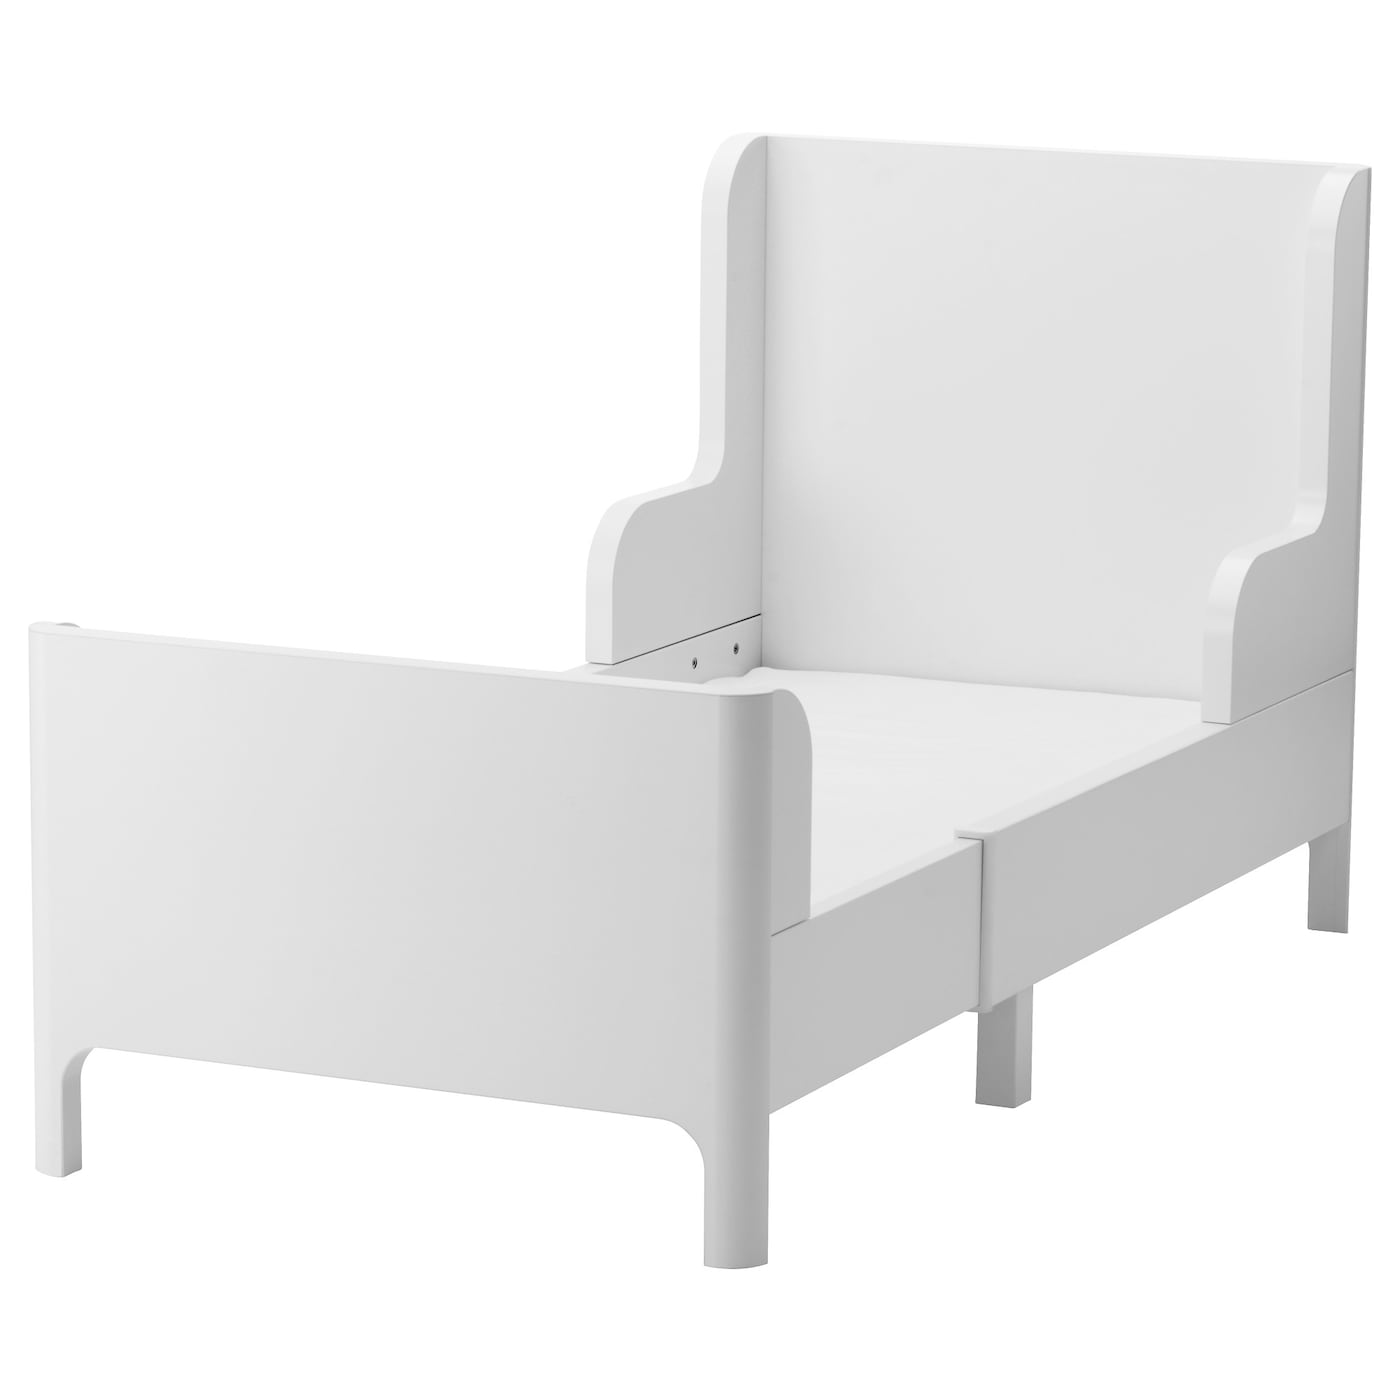 busunge meegroeibed wit 80 x 200 cm ikea. Black Bedroom Furniture Sets. Home Design Ideas